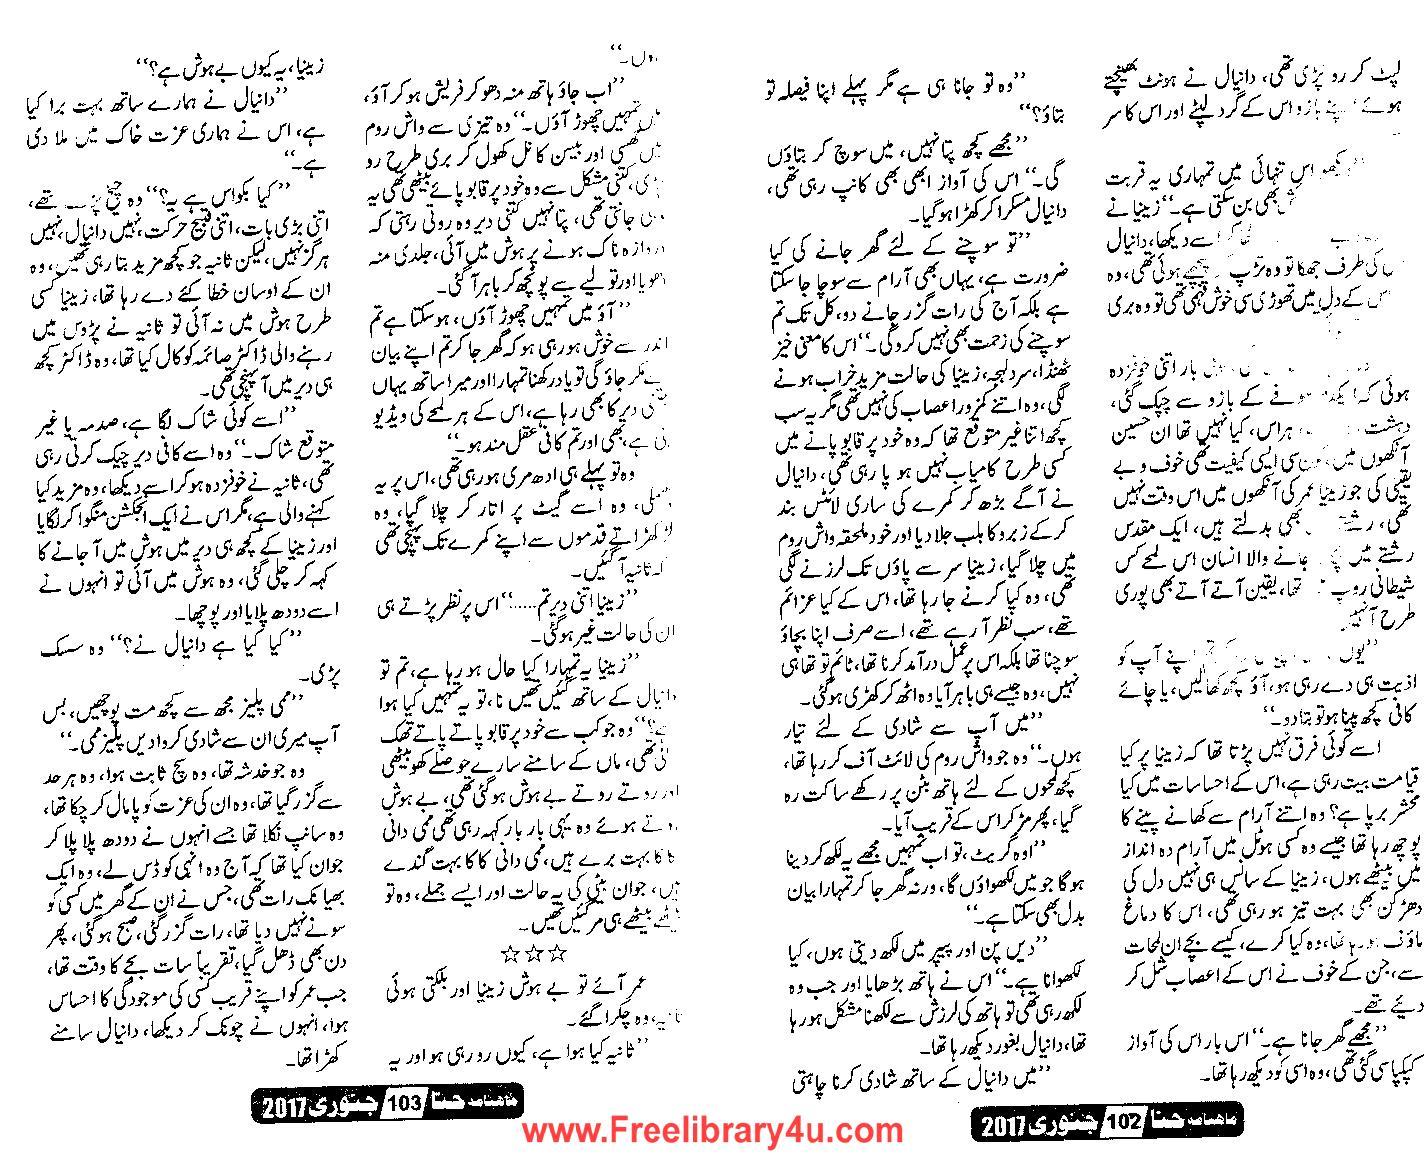 Urdu Novel Lovers: Jo bachay hain sang smait lo by Shabana